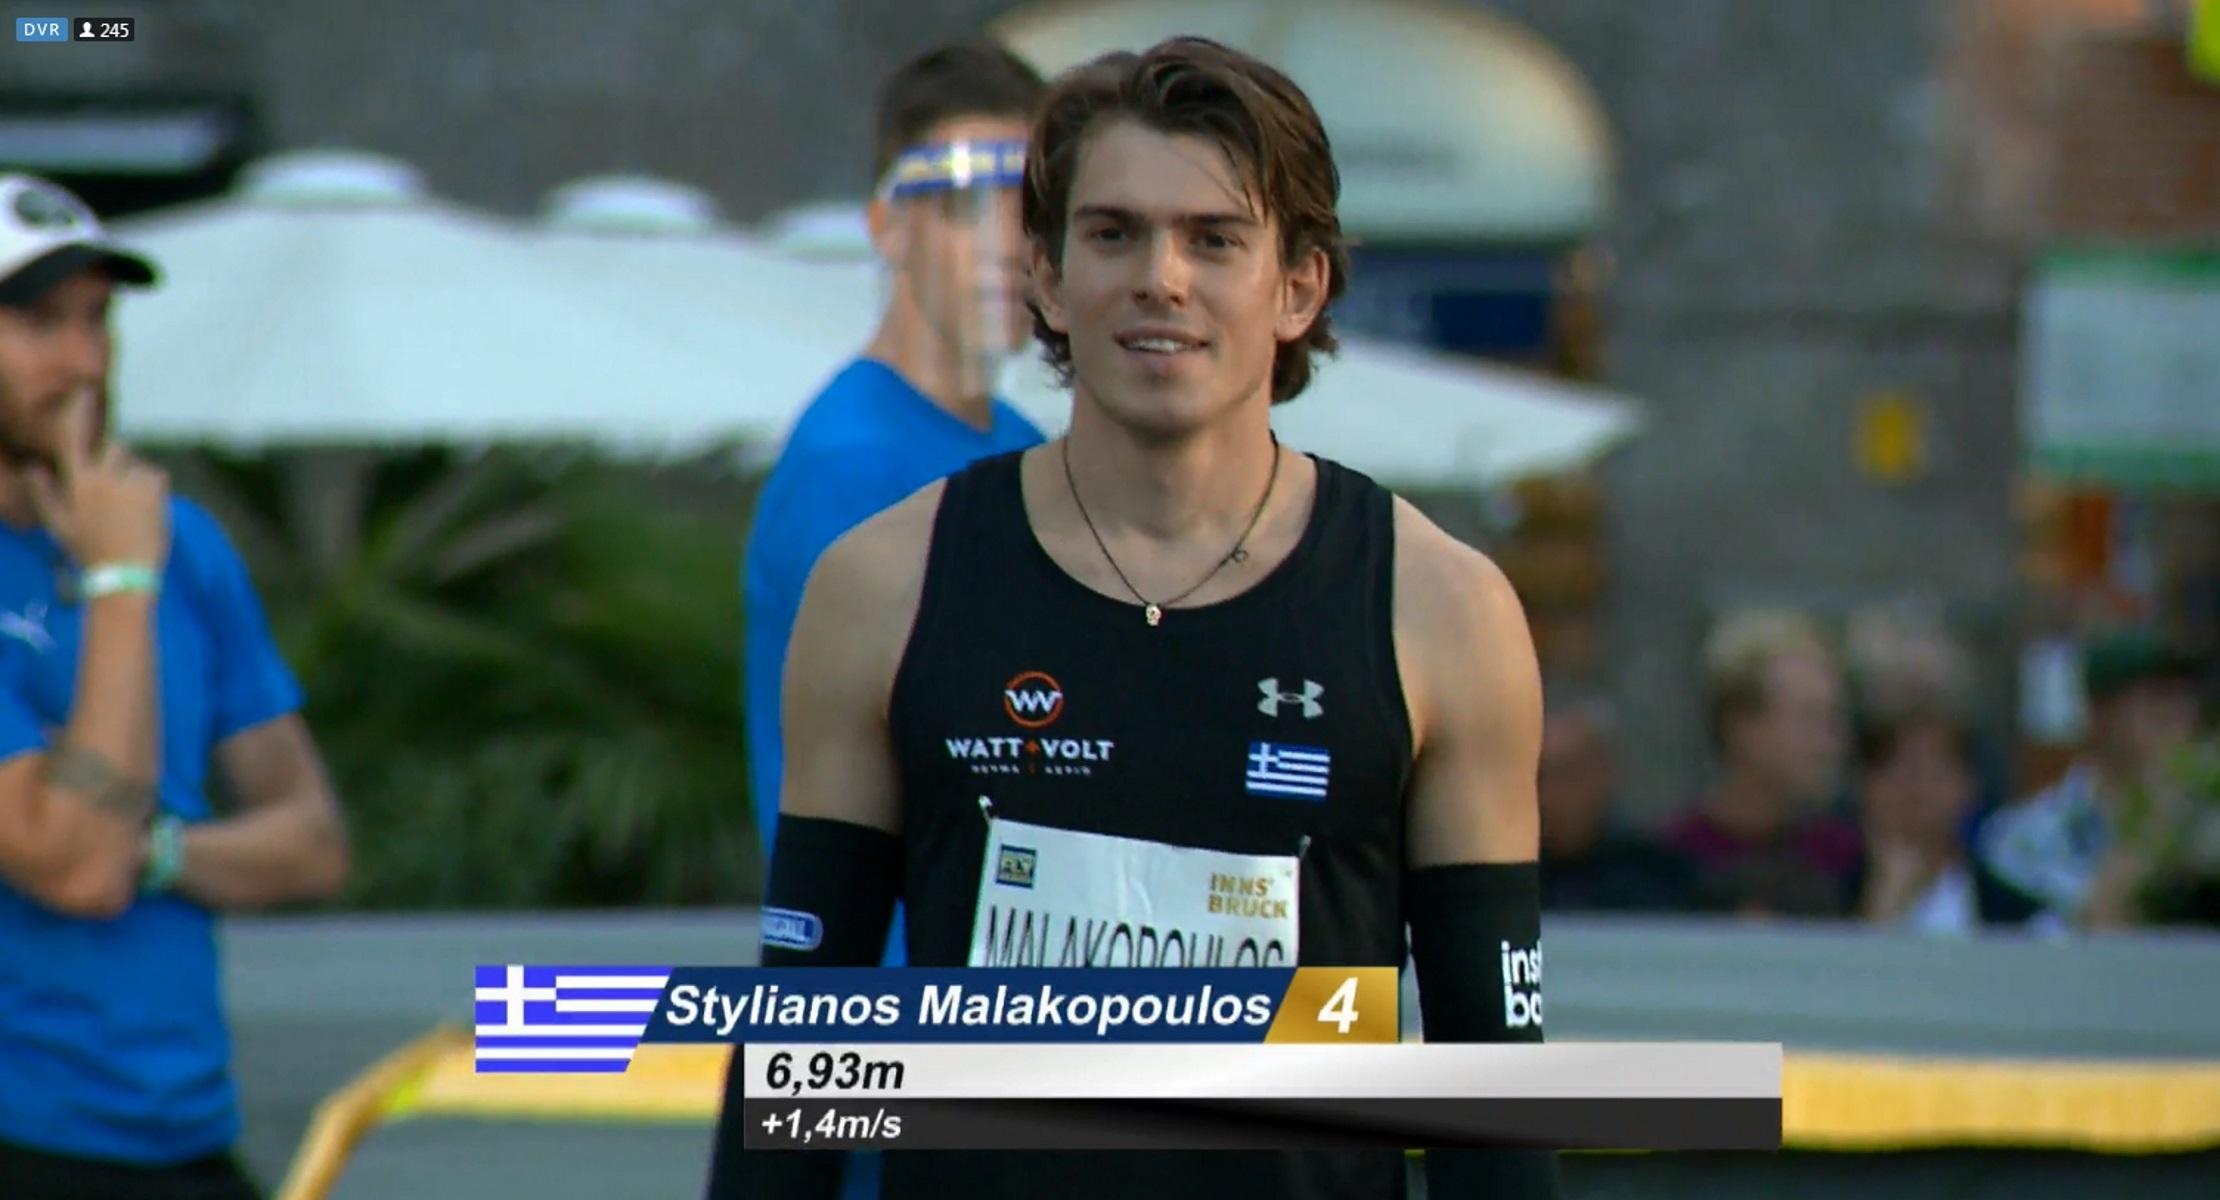 Golden Roof Challenge 2020: Παγκόσμιο ρεκόρ ο Μαλακόπουλος στο μήκος